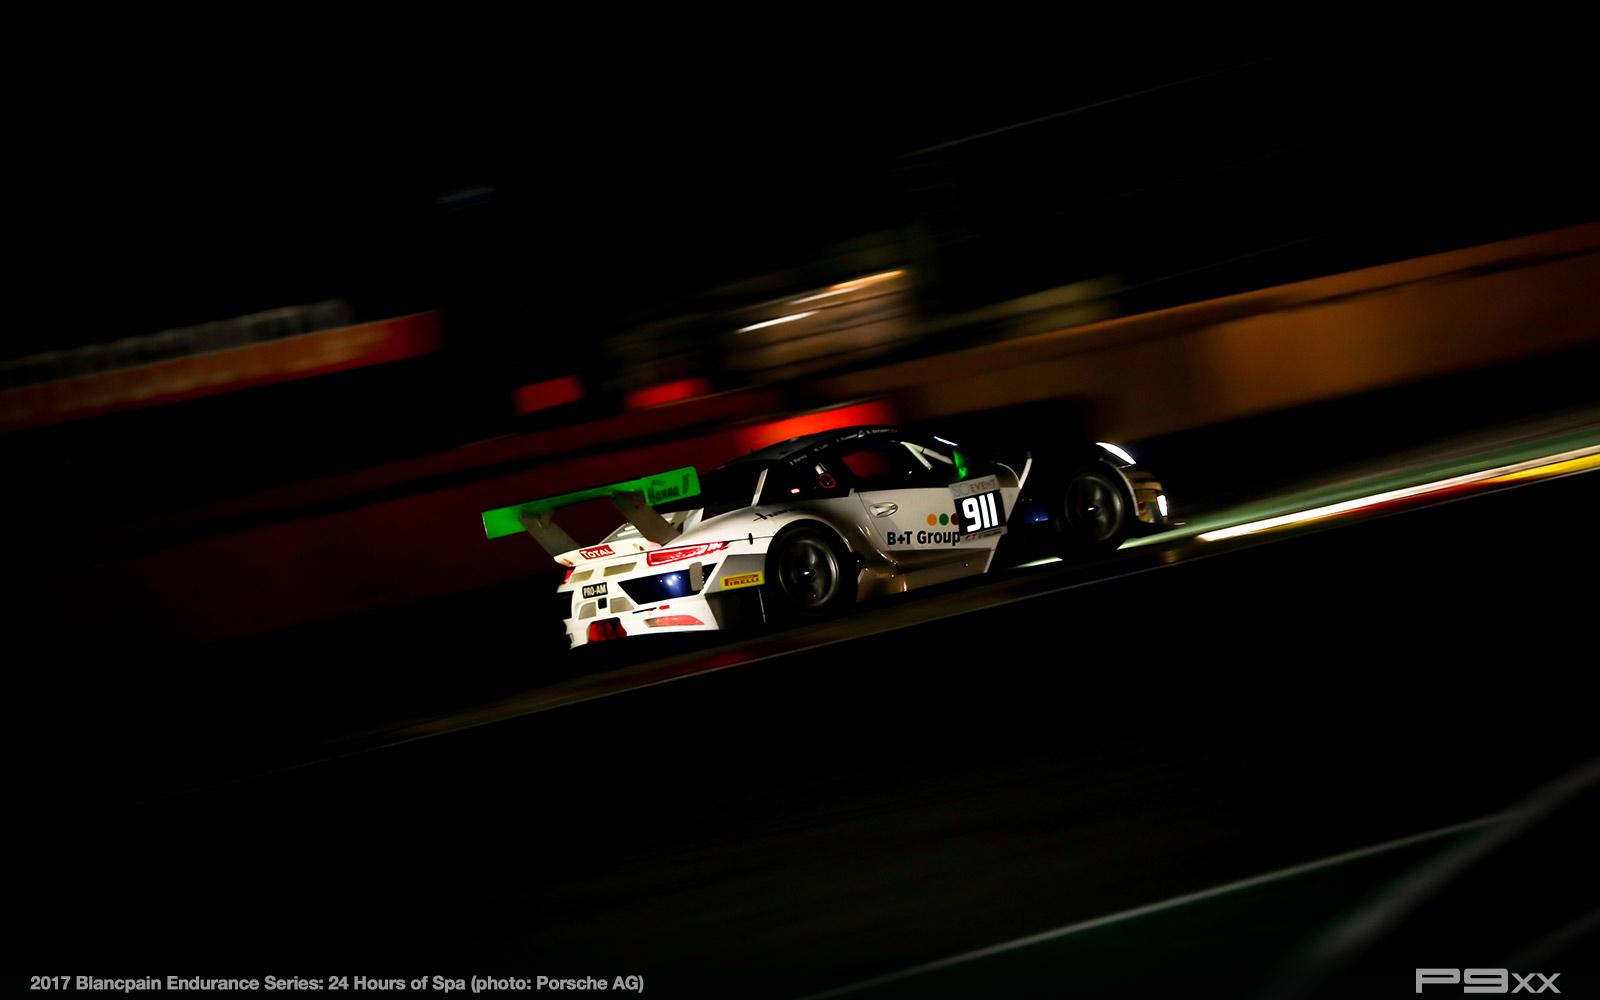 2017-24-Hours-of-Spa-Porsche-328